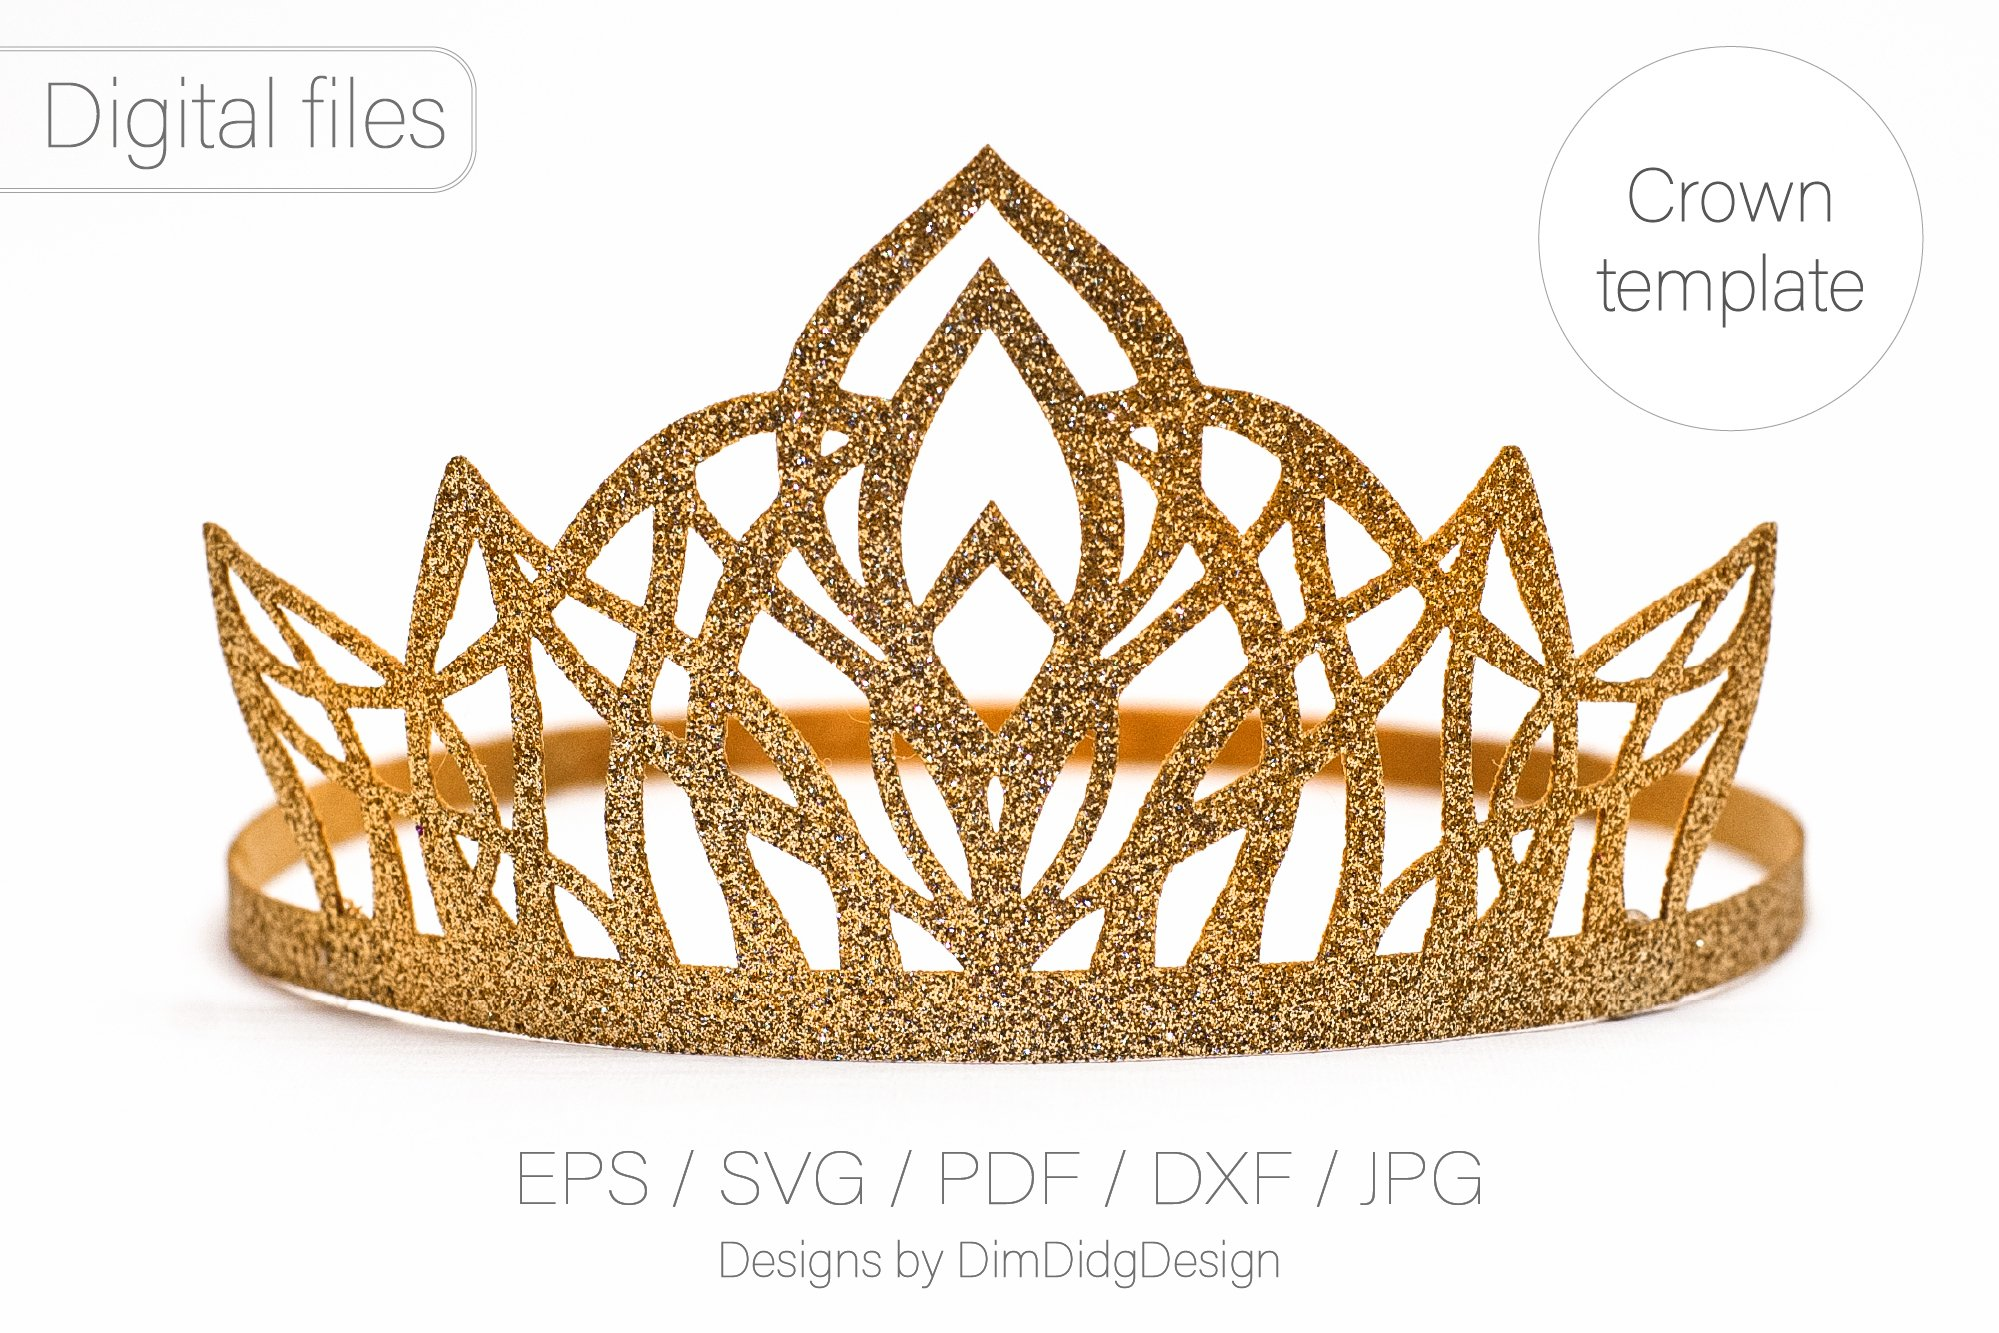 Princess Crown Svg Birthday Party Crown Princess Tiara 1378091 Paper Cutting Design Bundles